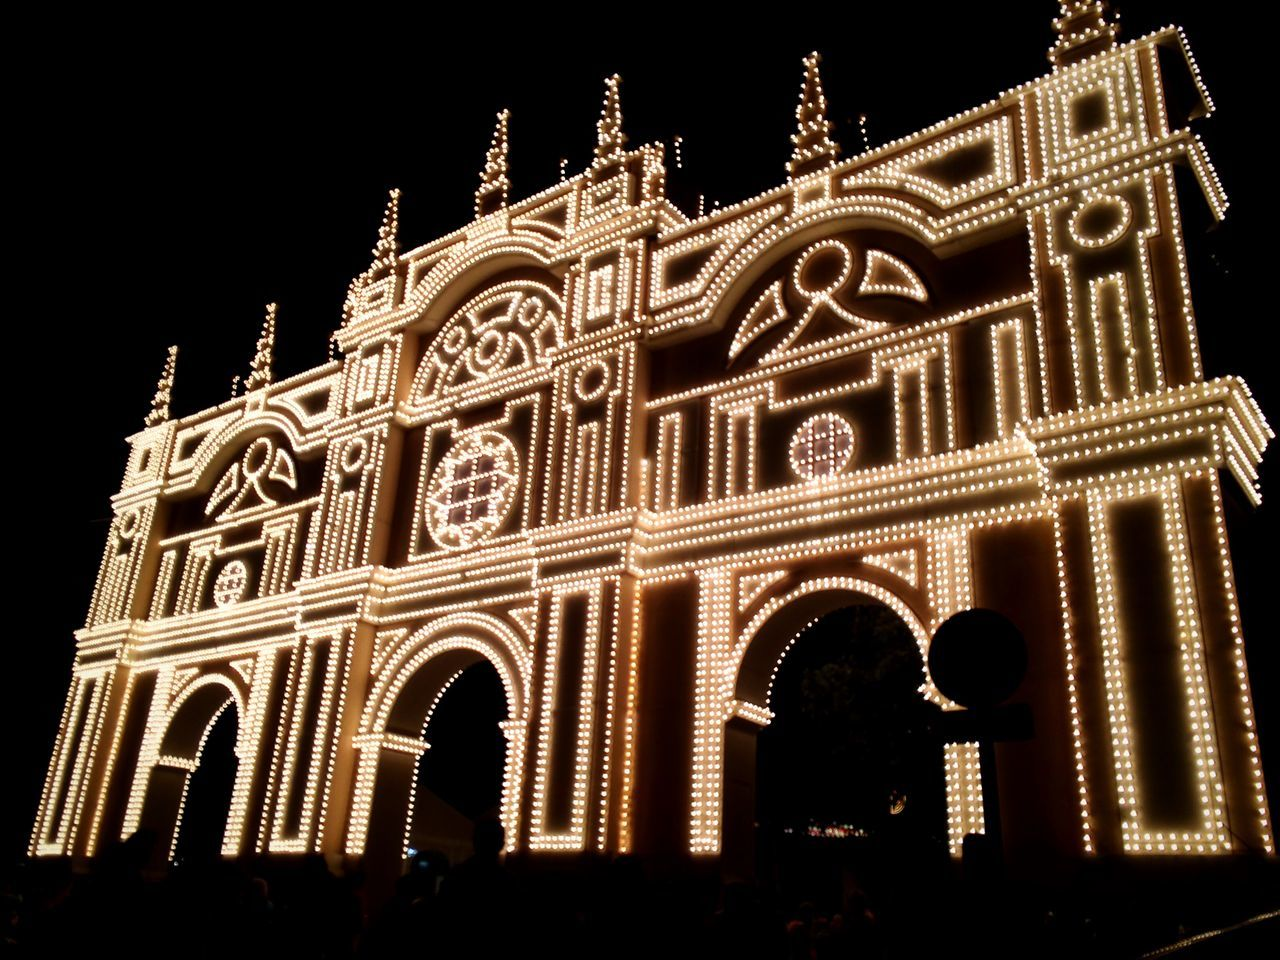 La feria de Granada Open Edit EEA3 - Granada Andalucía Getting Inspired Feria EyeEm Best Shots